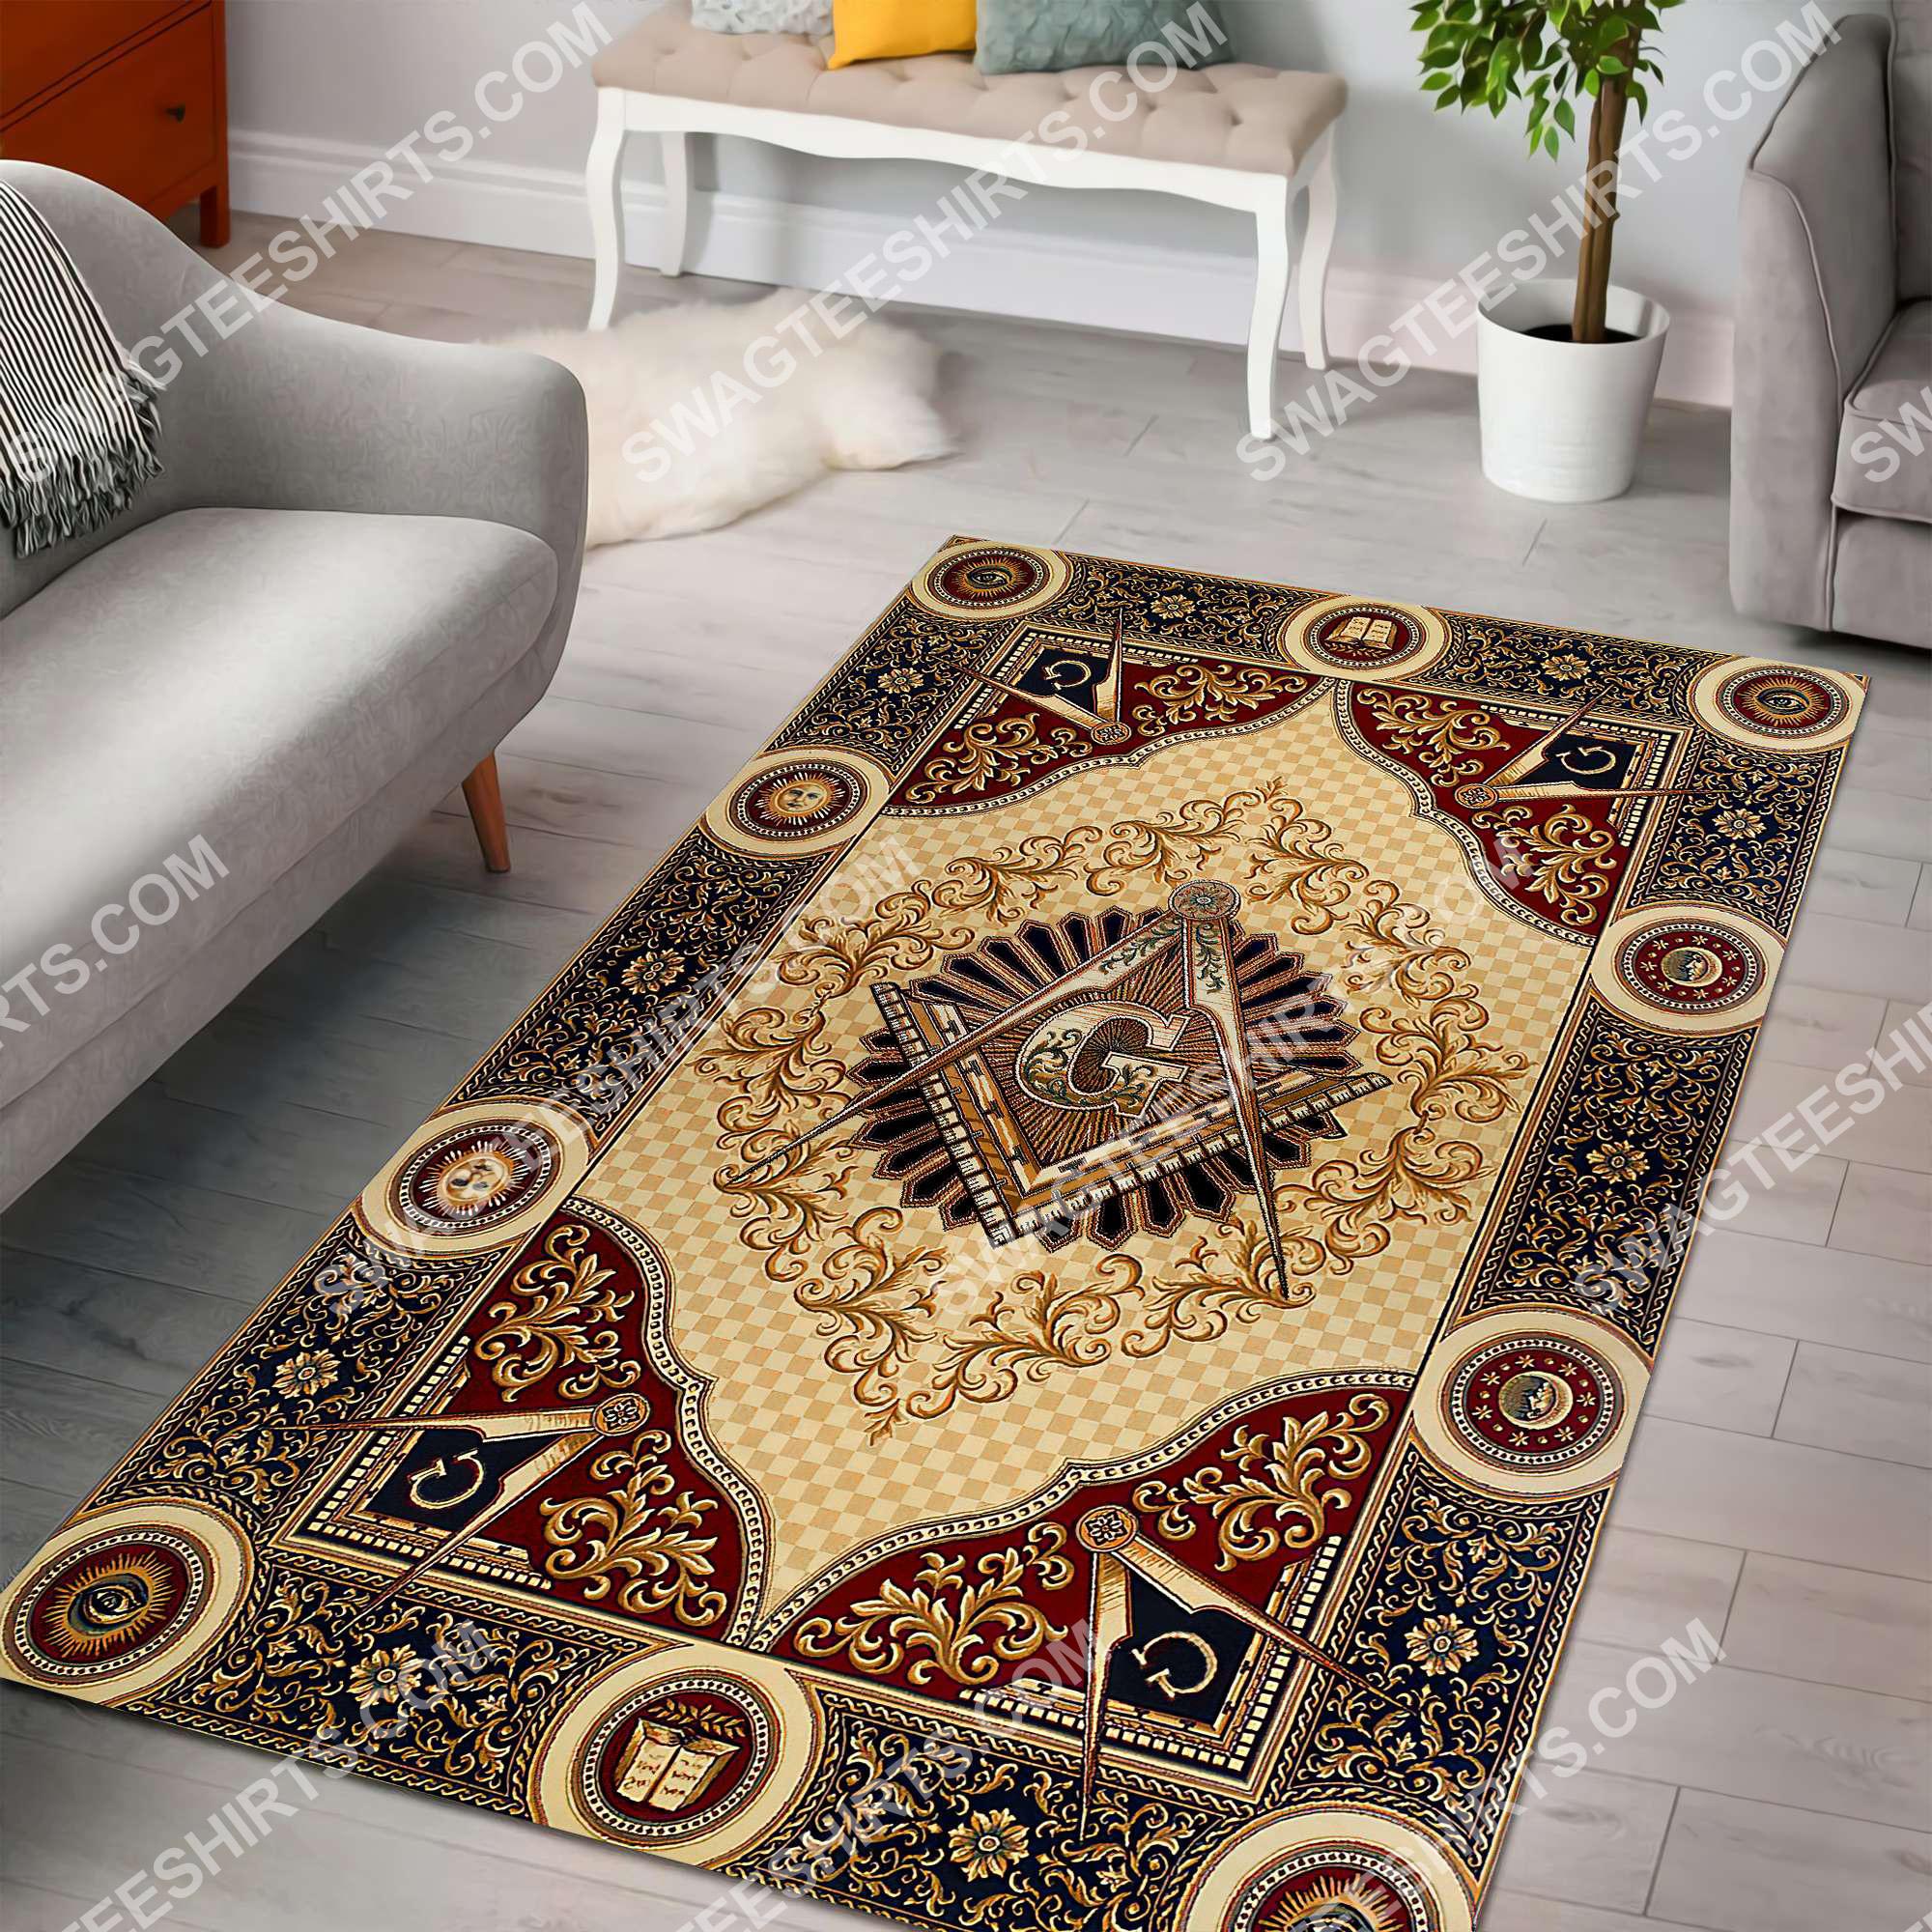 freemasonry masonic lodges all over printed rug 2(1)